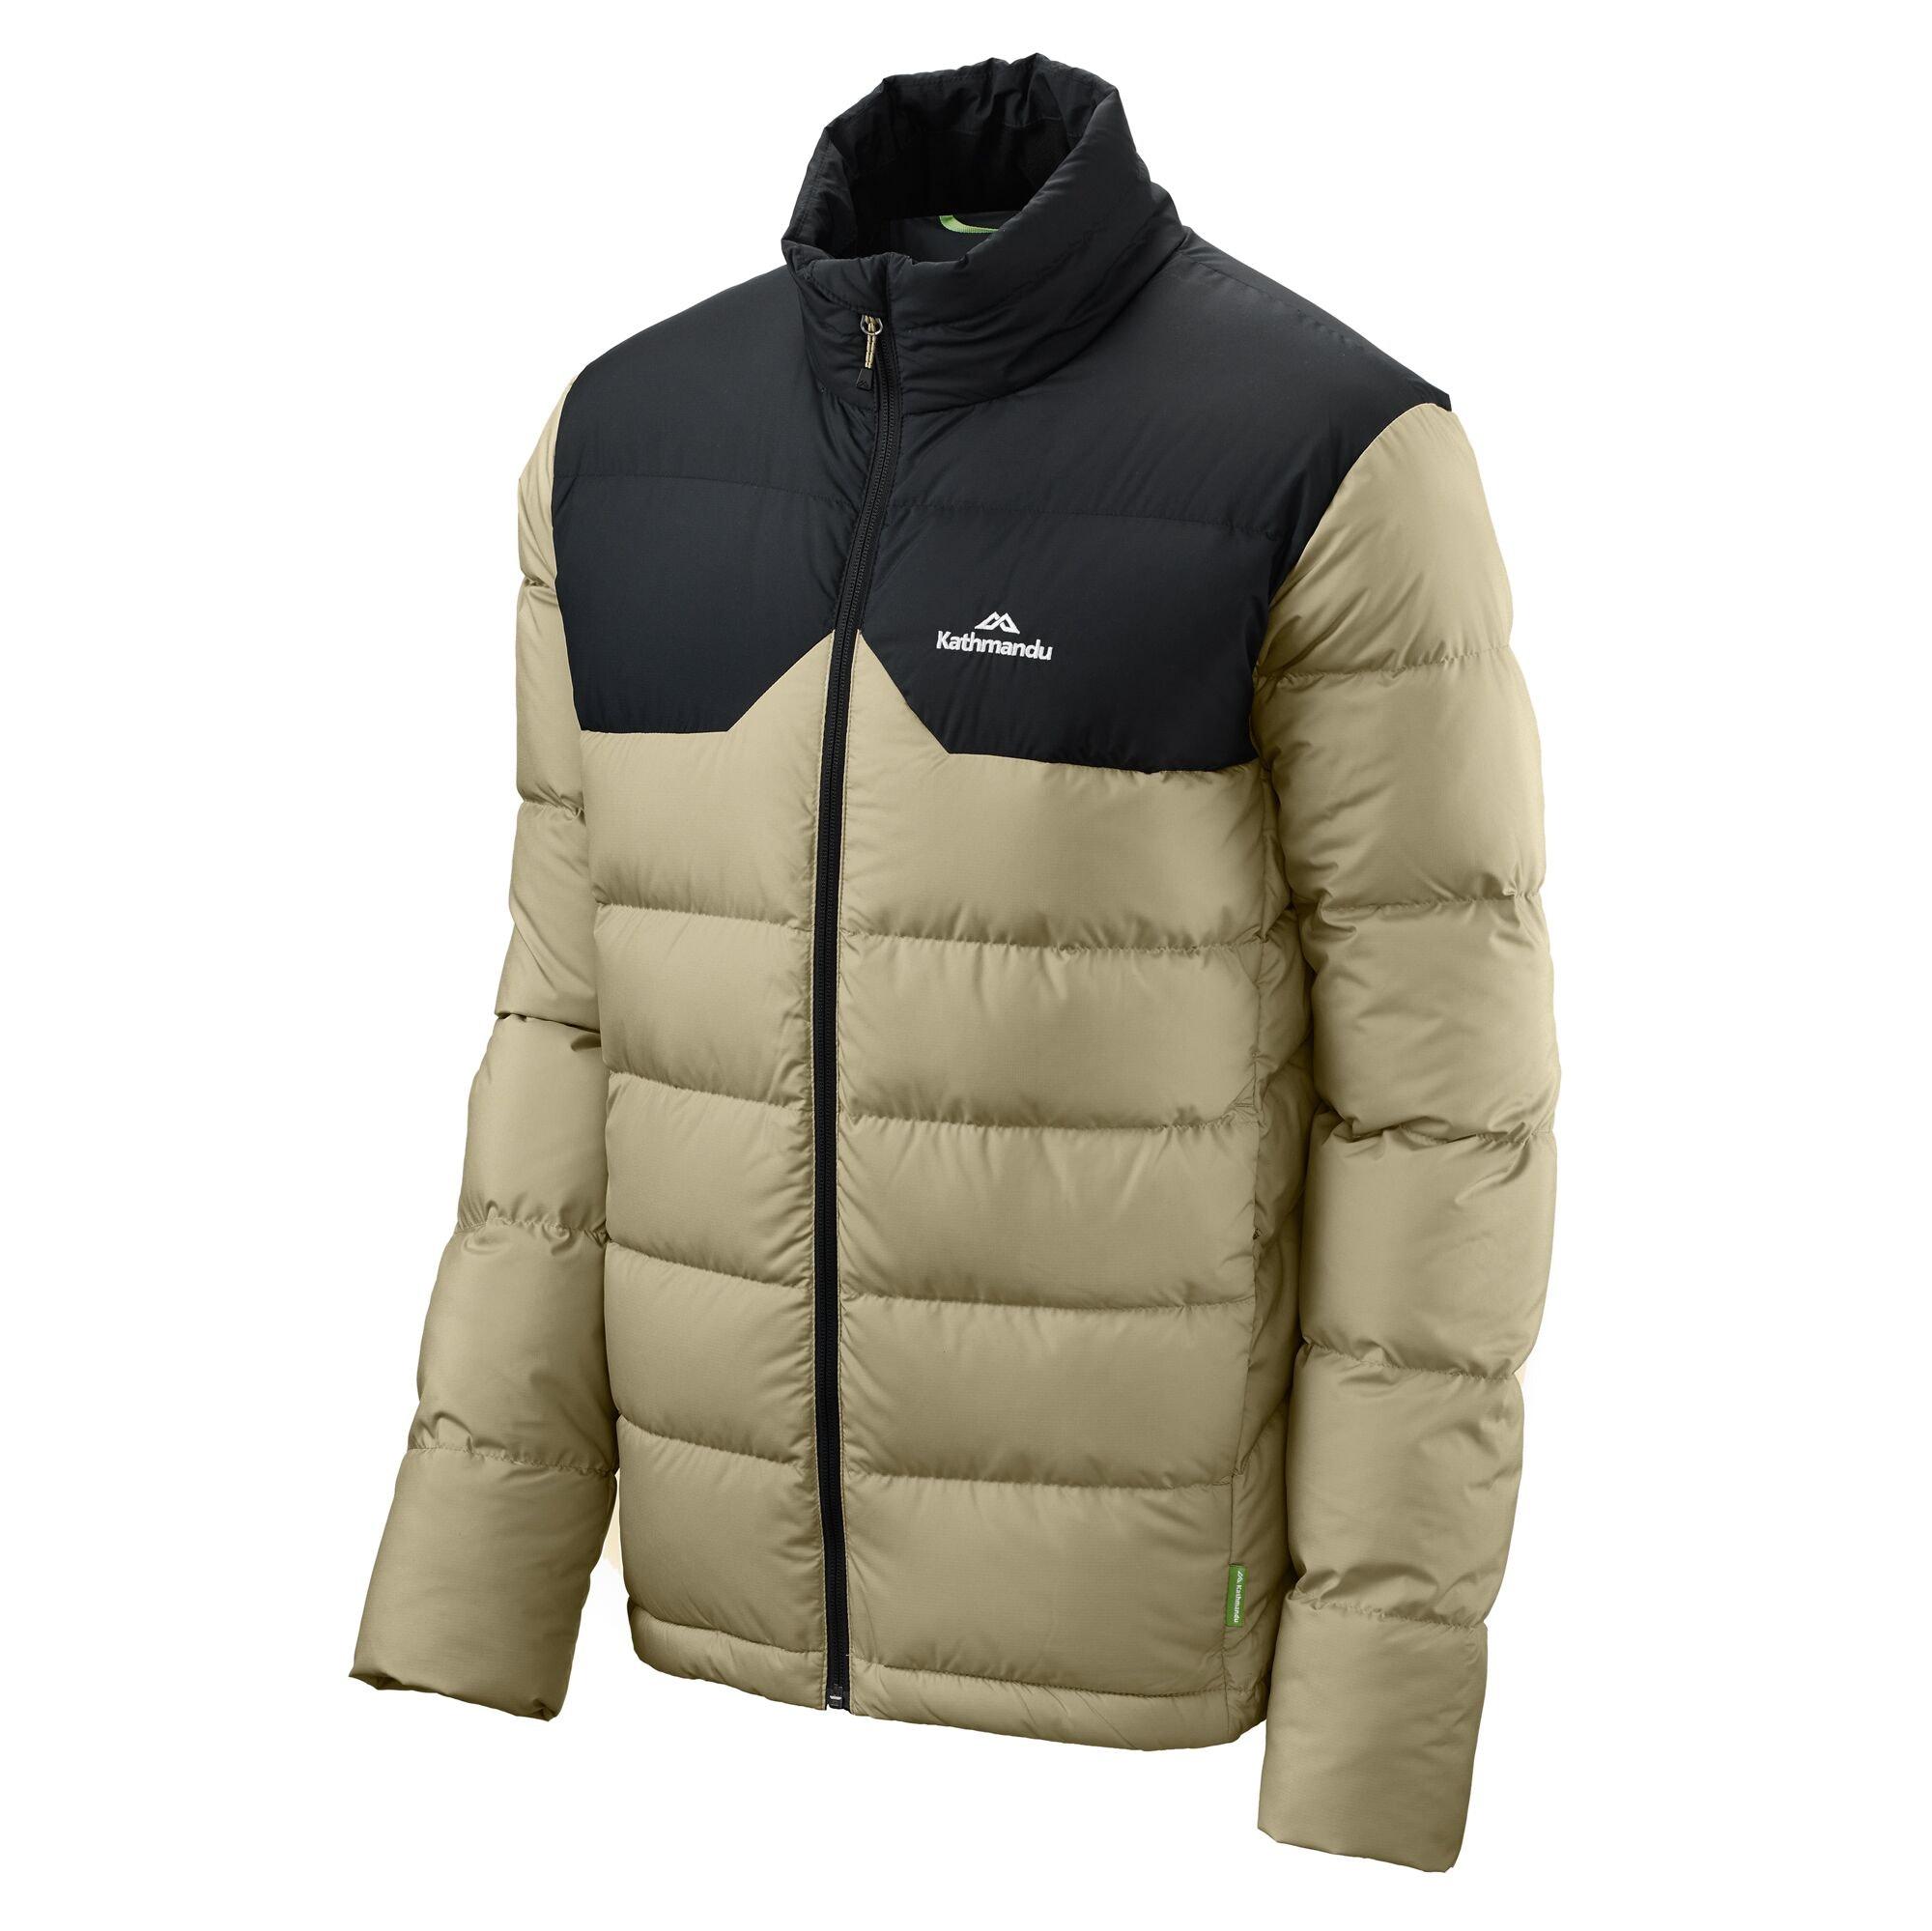 thumbnail 31 - NEW Kathmandu Epiq Mens 600 Fill Down Puffer Warm Outdoor Winter Jacket